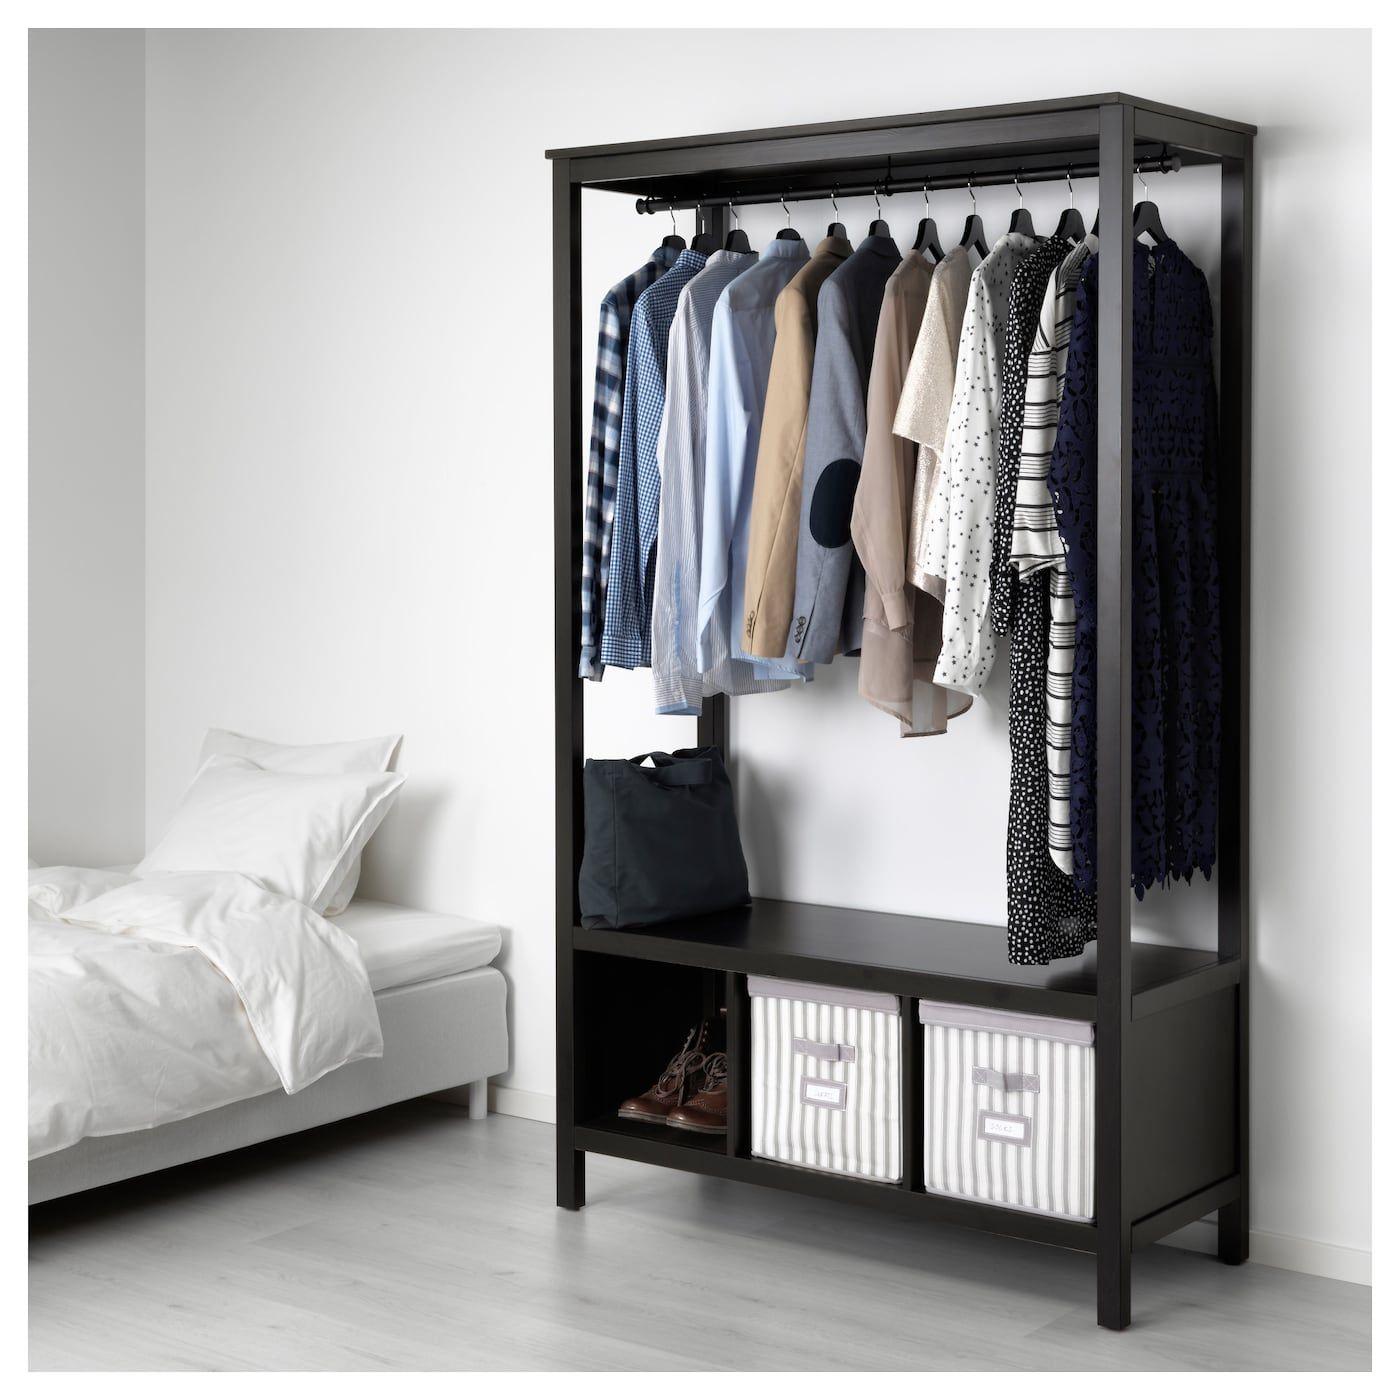 HEMNES Open wardrobe blackbrown 47 1/4x19 5/8x77 1/2